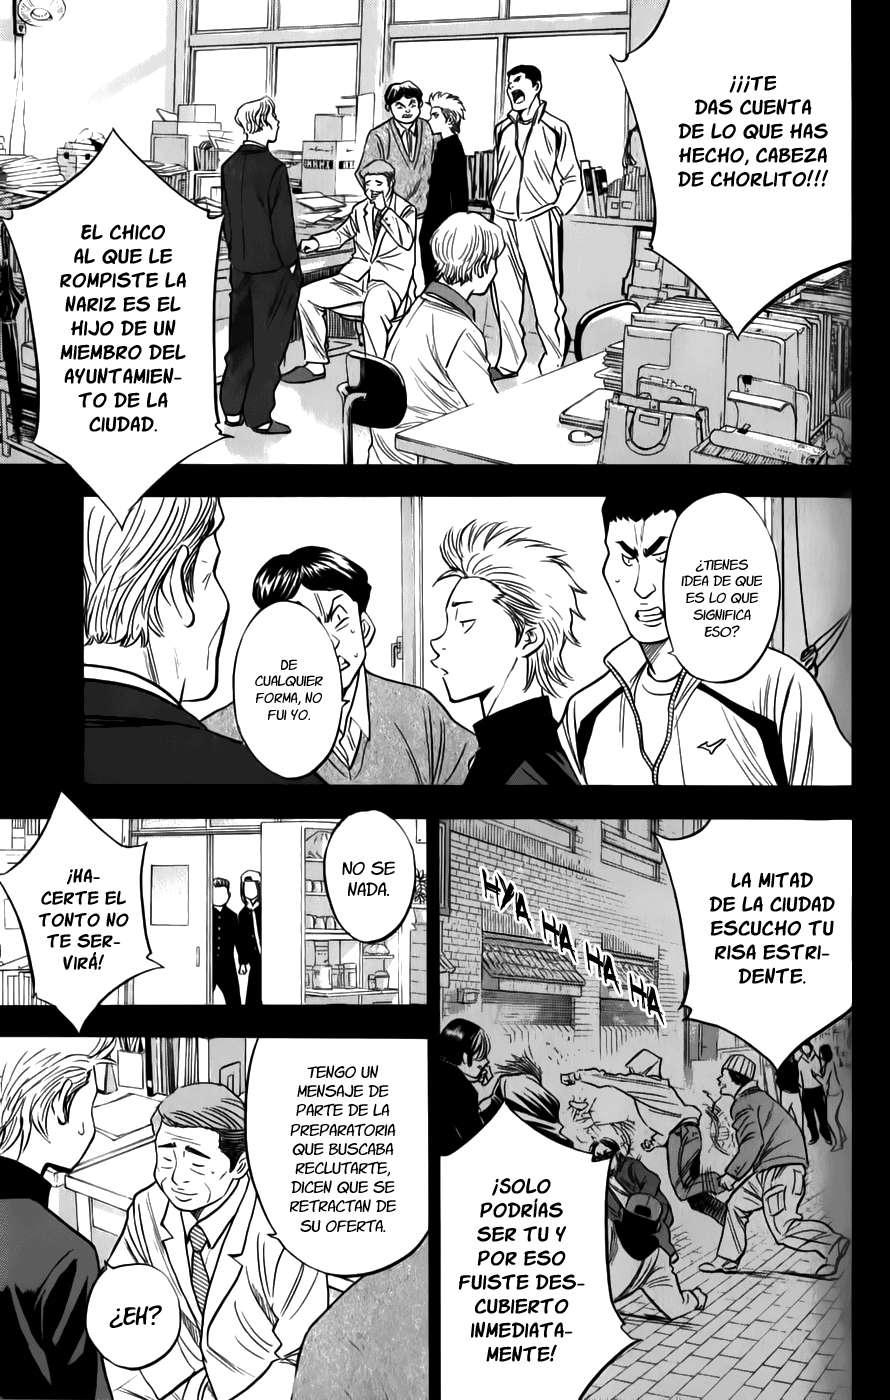 http://c5.ninemanga.com/es_manga/24/1752/395648/005cbfa3ec6690c005d1de9182683241.jpg Page 4